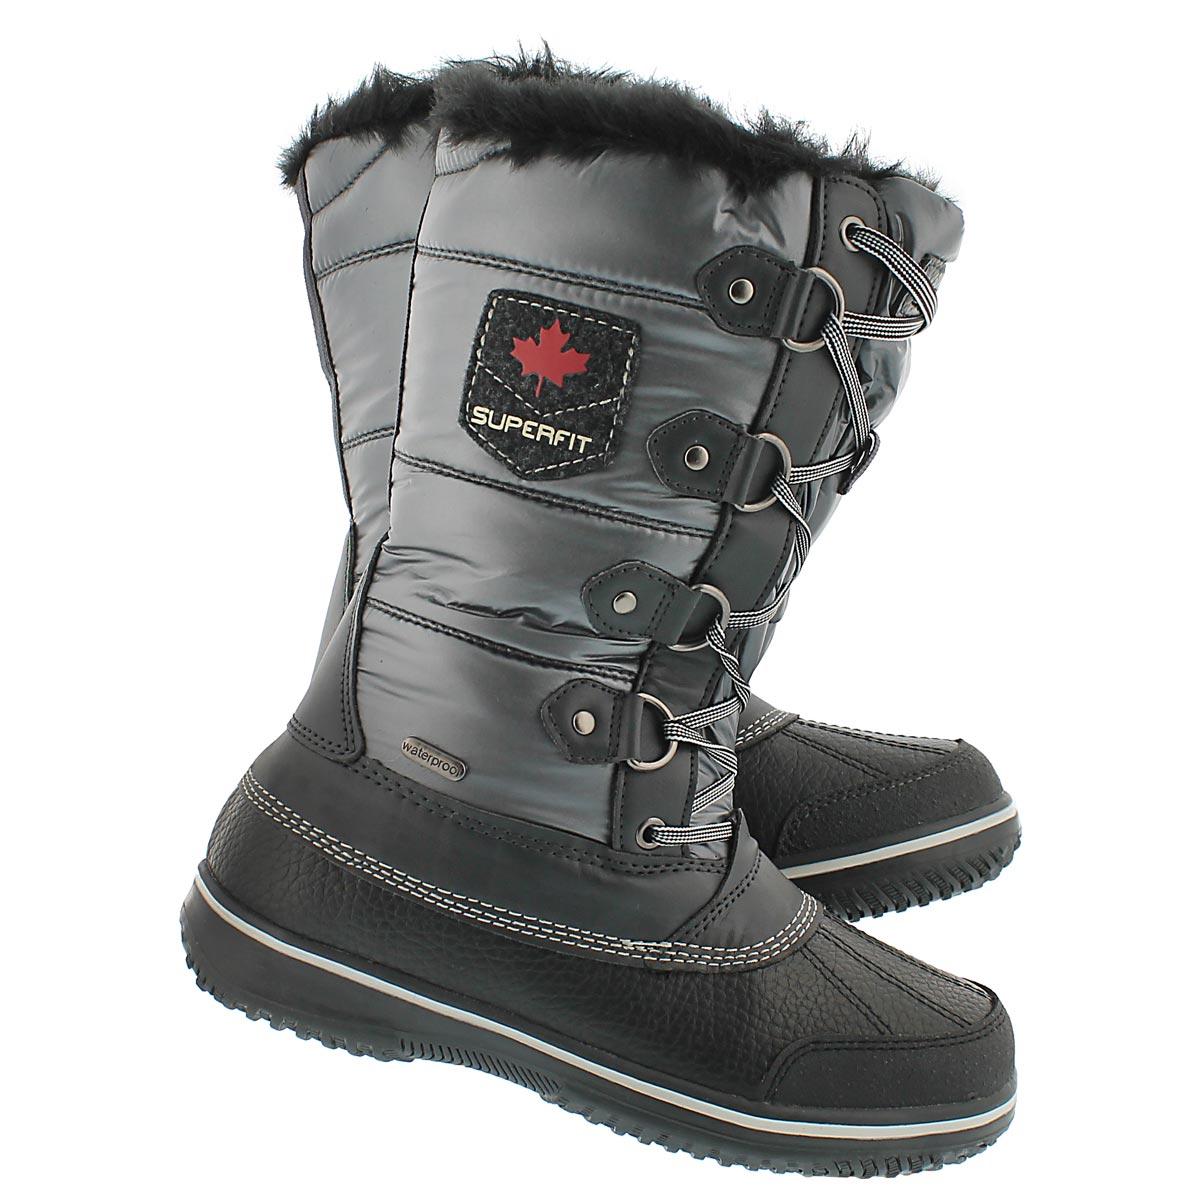 Lds Ulla blk/pwtr wtrpf winter boot